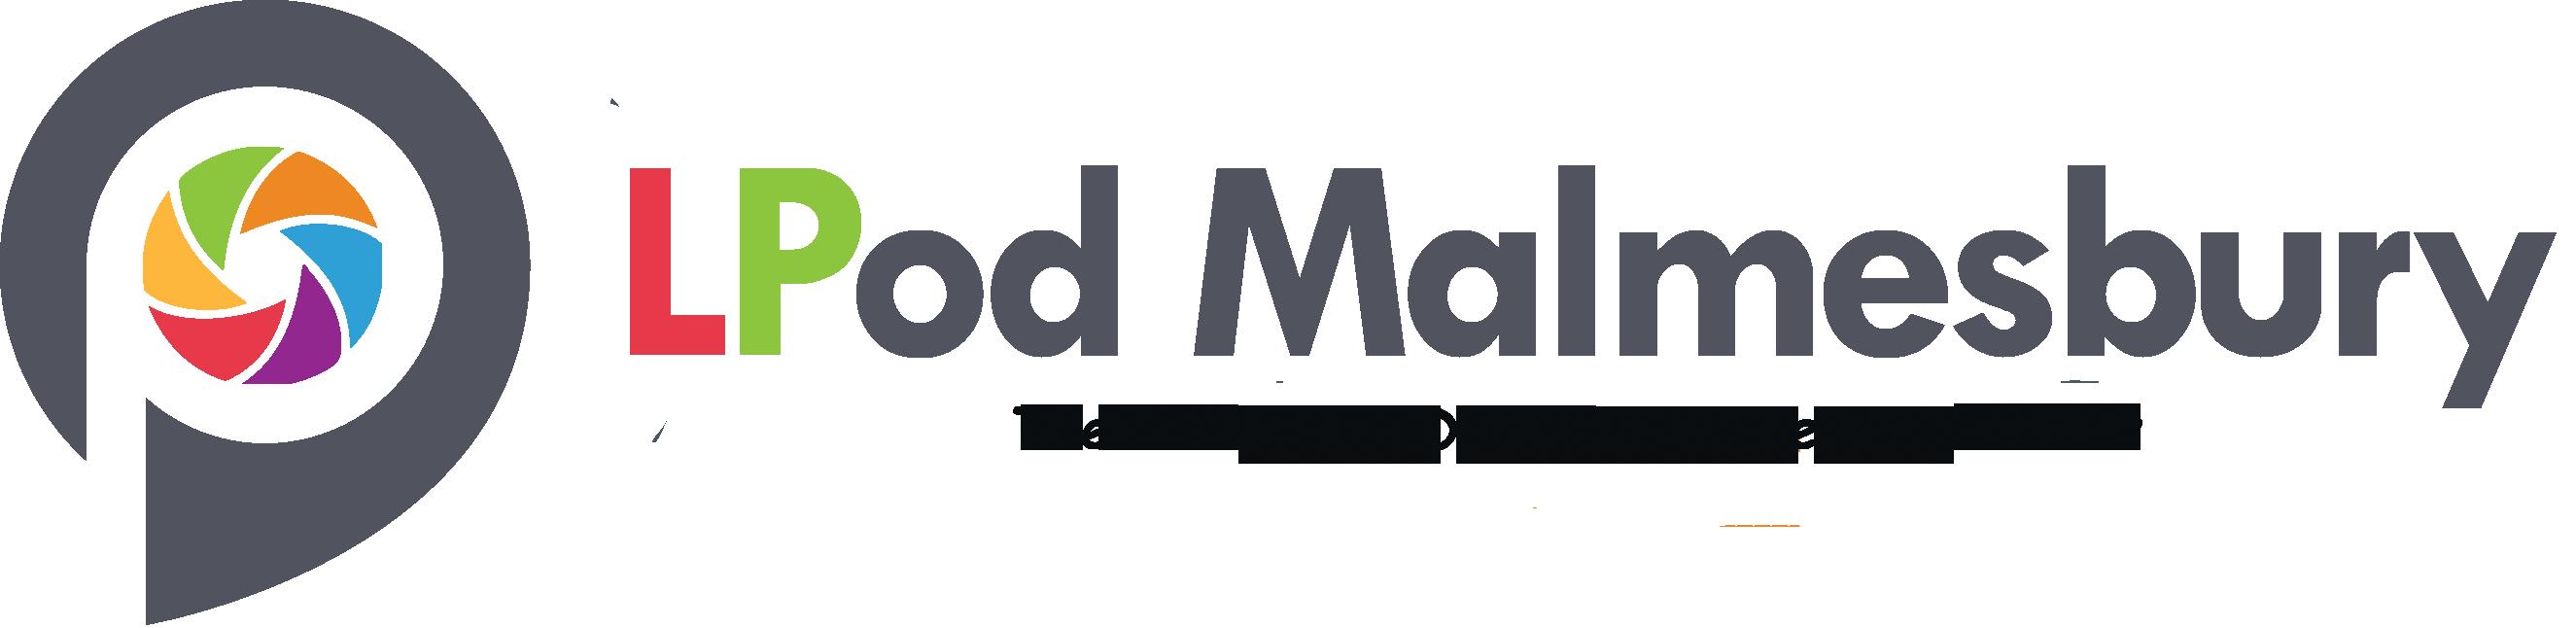 intensive driving courses Malmesbury